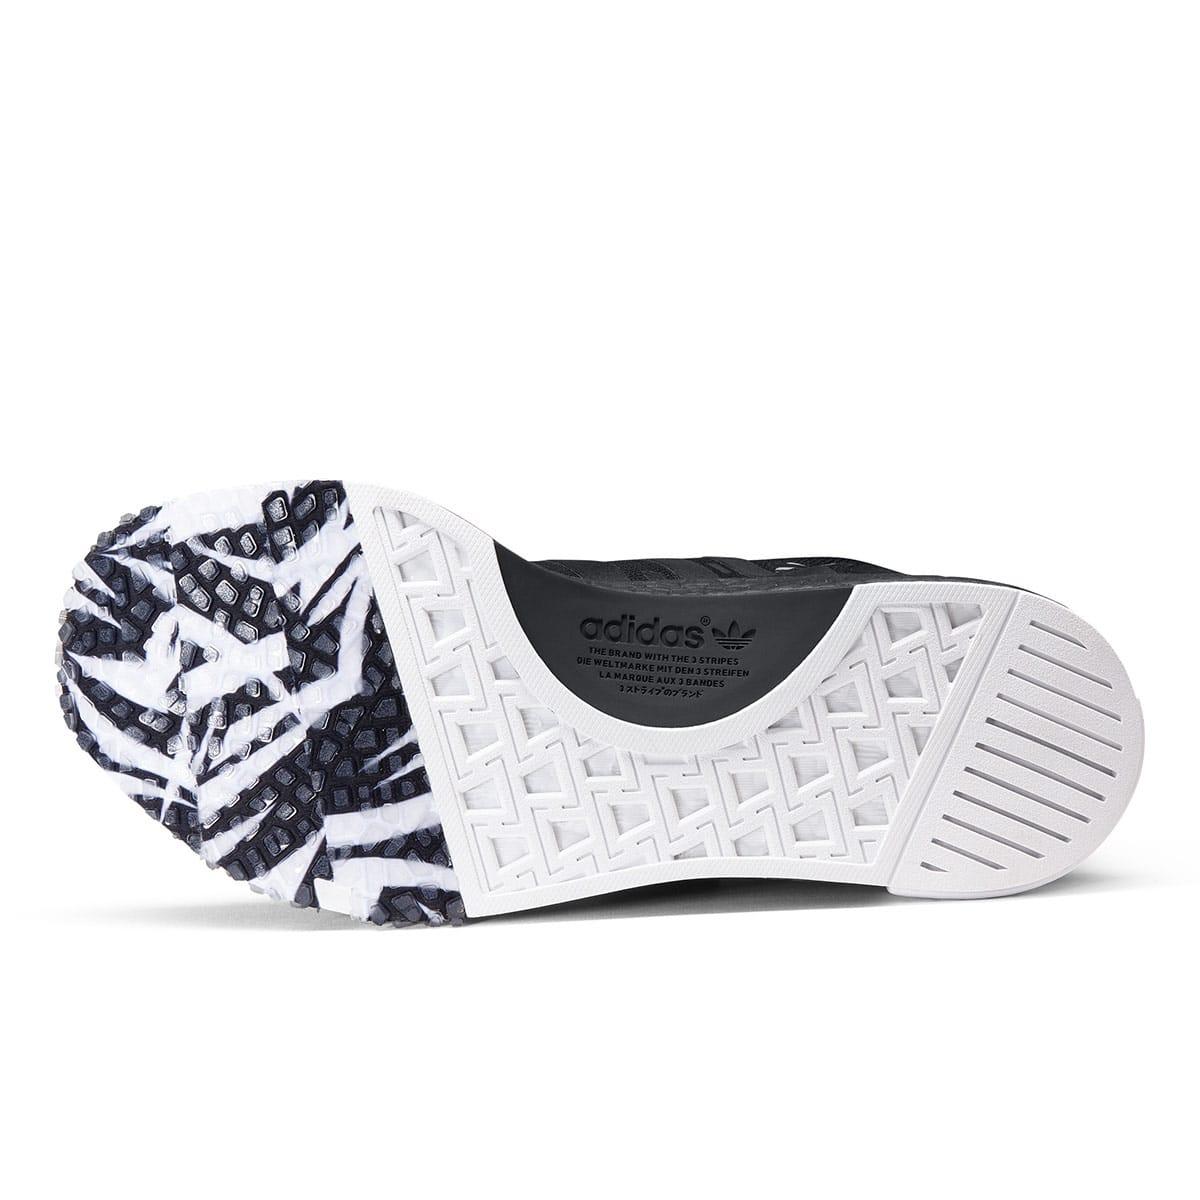 best sneakers 77c93 3a43e Adidas Consortium x Juice NMD Racer (Core Black & White)